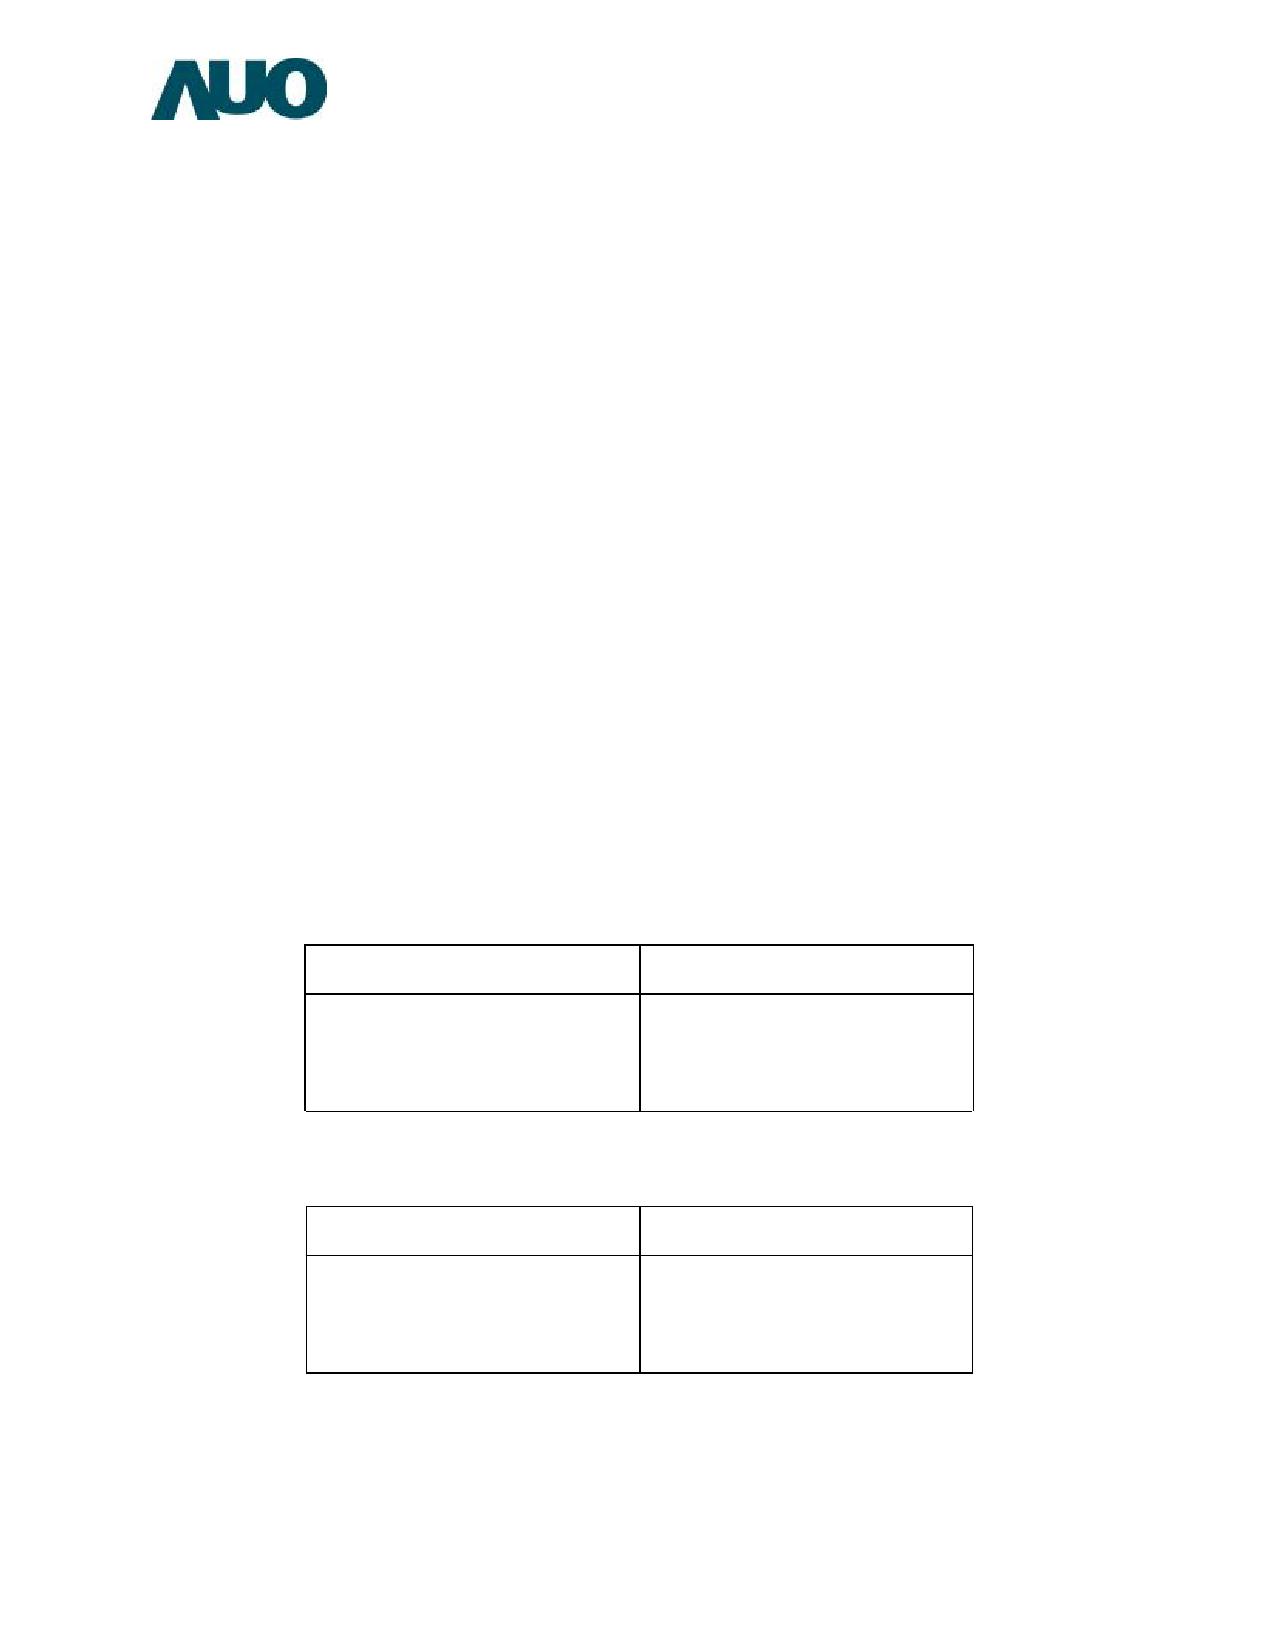 G104SN02_V0 datasheet